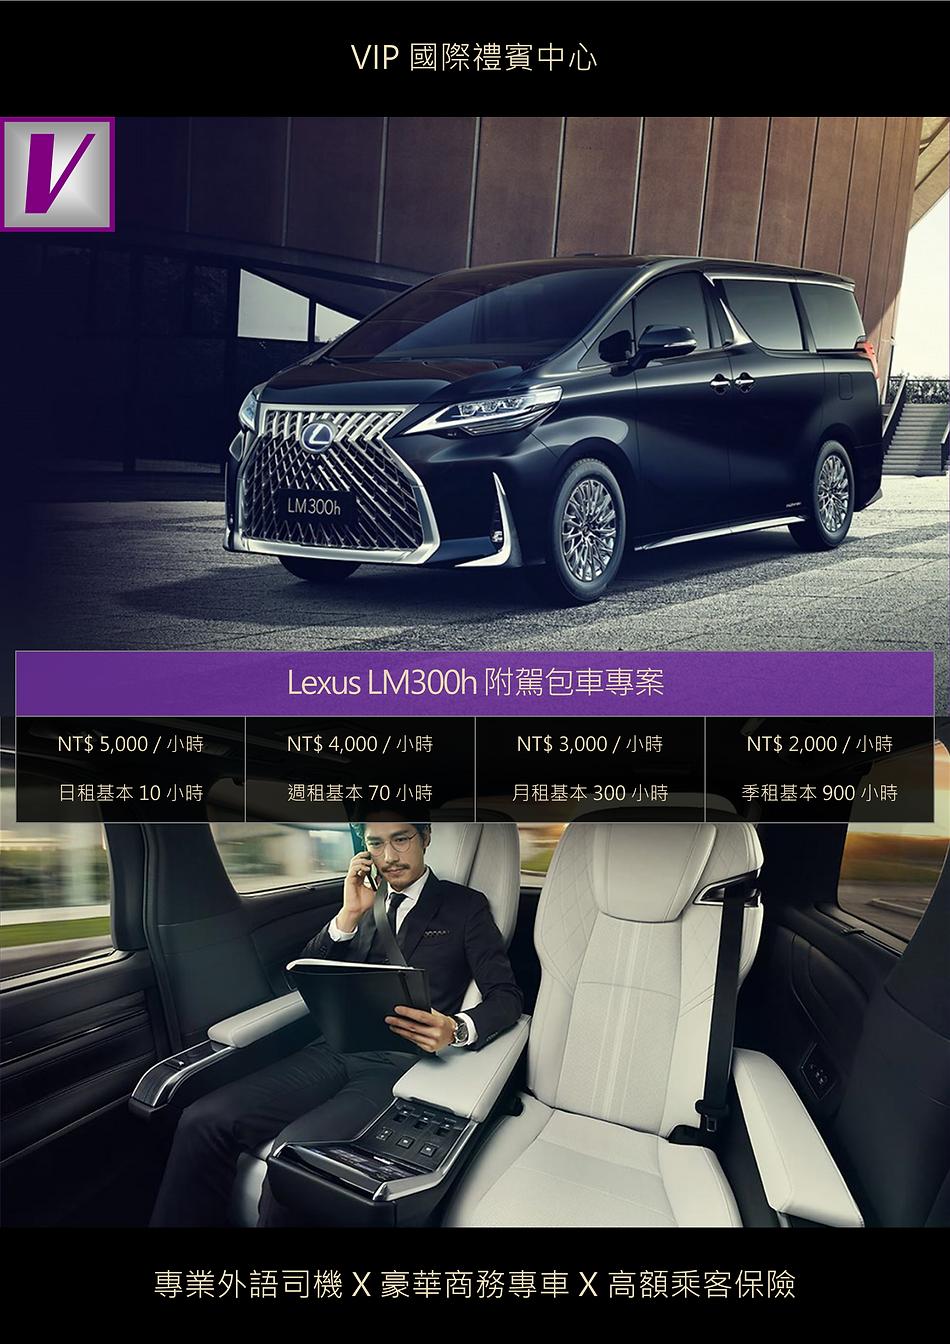 VIP國際禮賓中心 LEXUS LM300h 4人座 附駕包車專案 DM.png